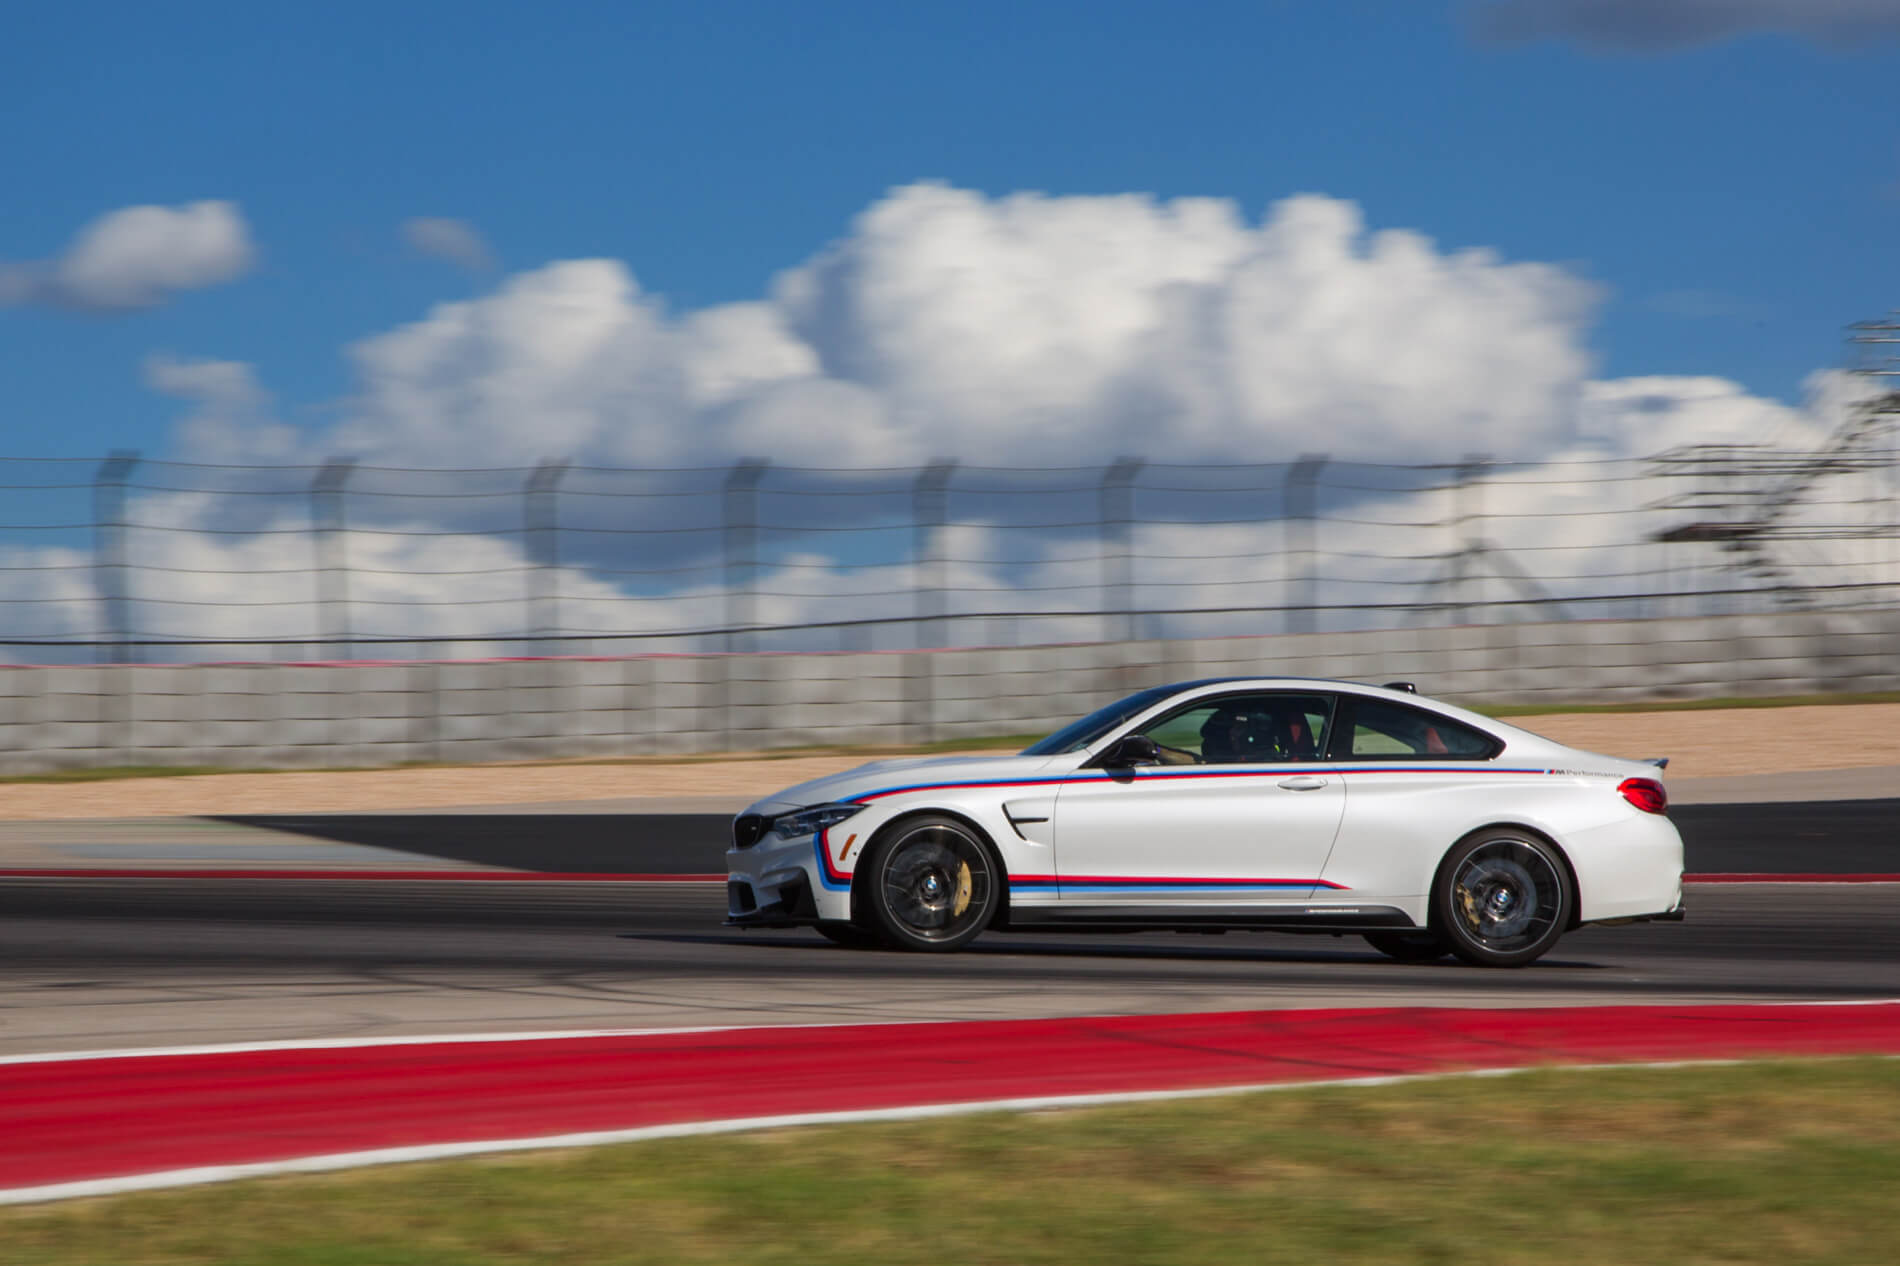 BMW-M-Track-Days-Austin-2017-52 (1).jpg